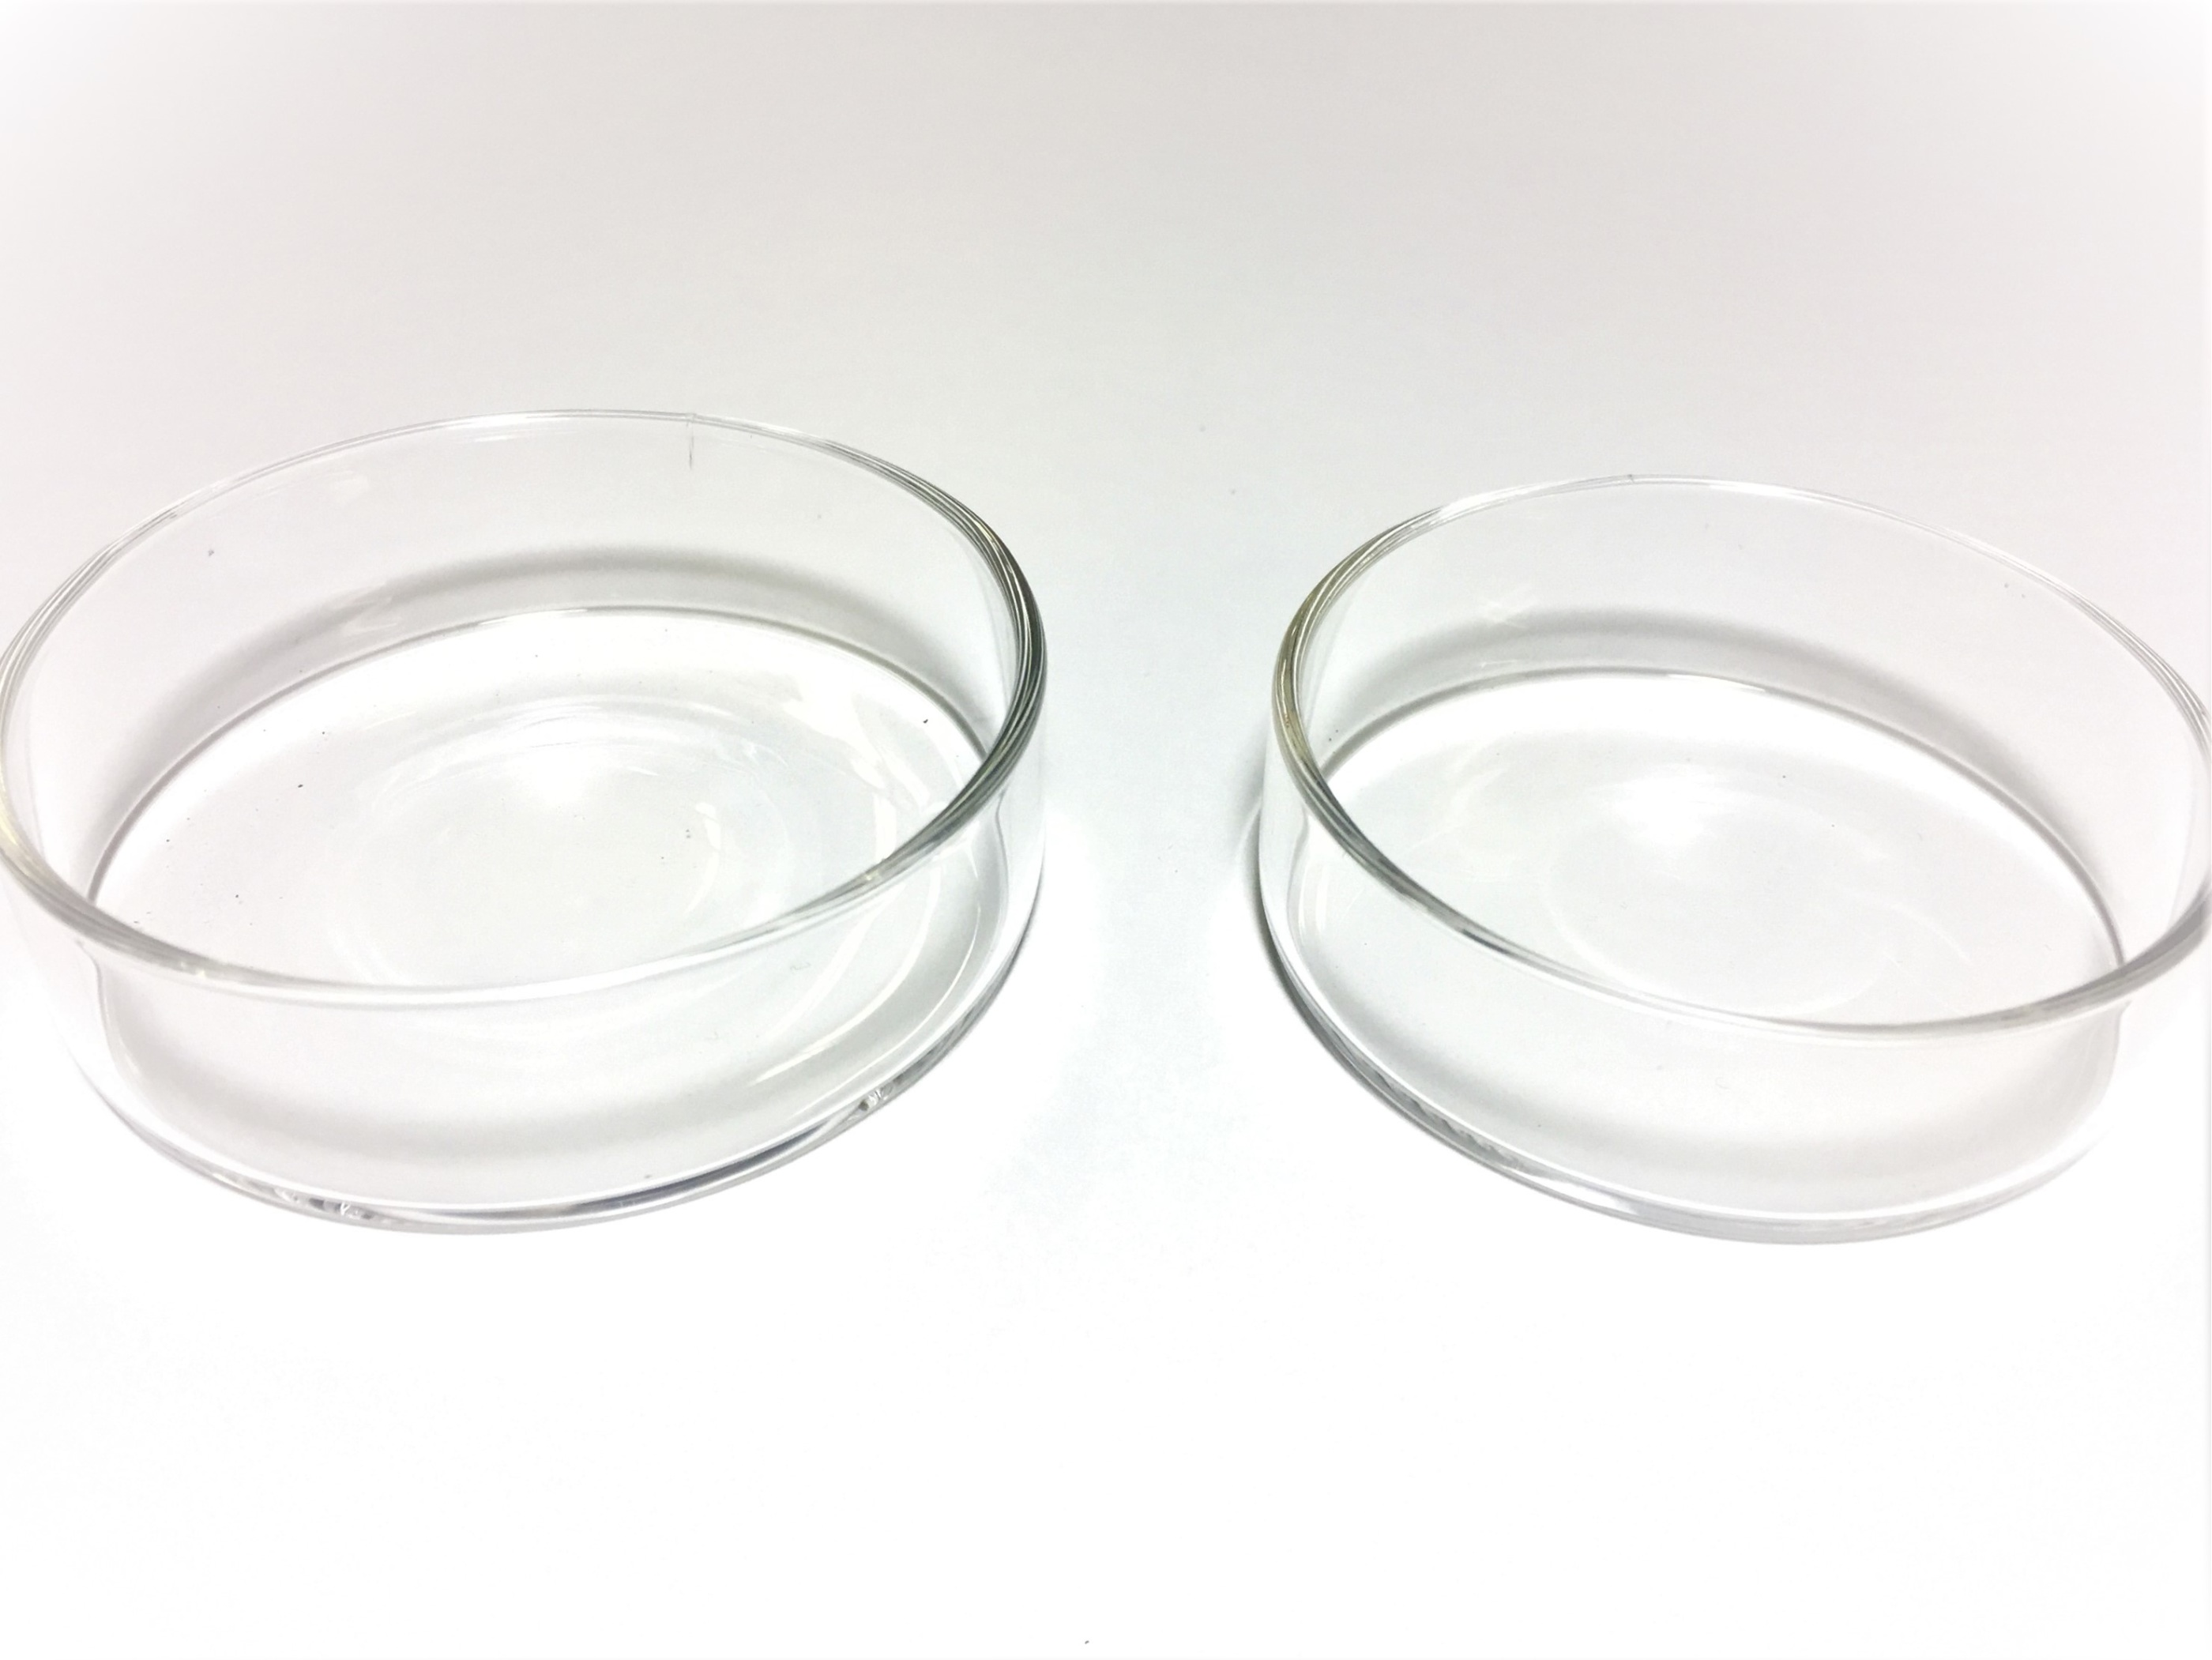 Foderskålar glas